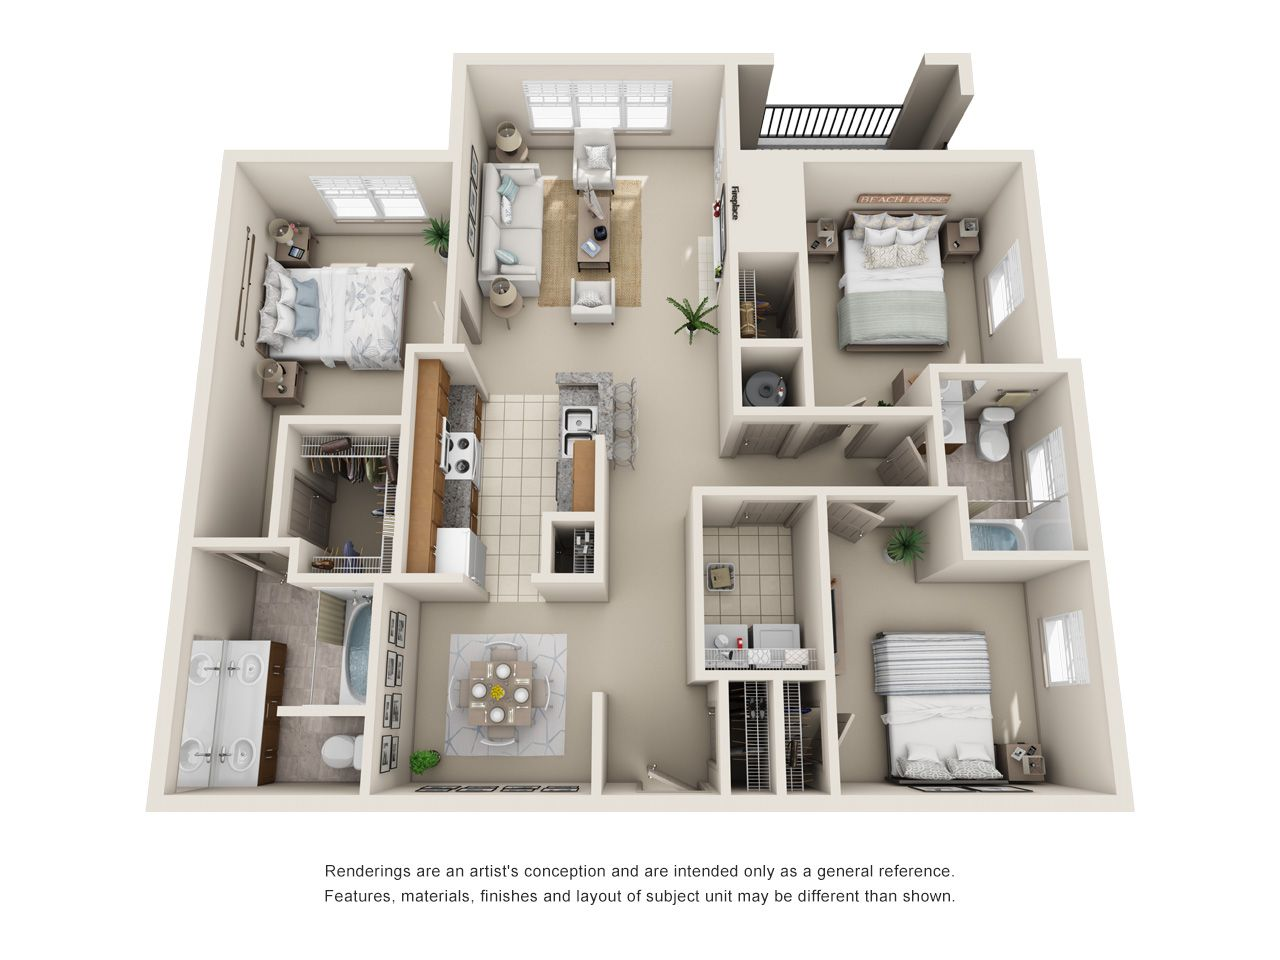 1 2 3 Bedroom Apartments In Lewisville Tx Floor Plans Steadfast Apartment Renting Rental Apartment Layout Apartment Floor Plans Apartment Plans